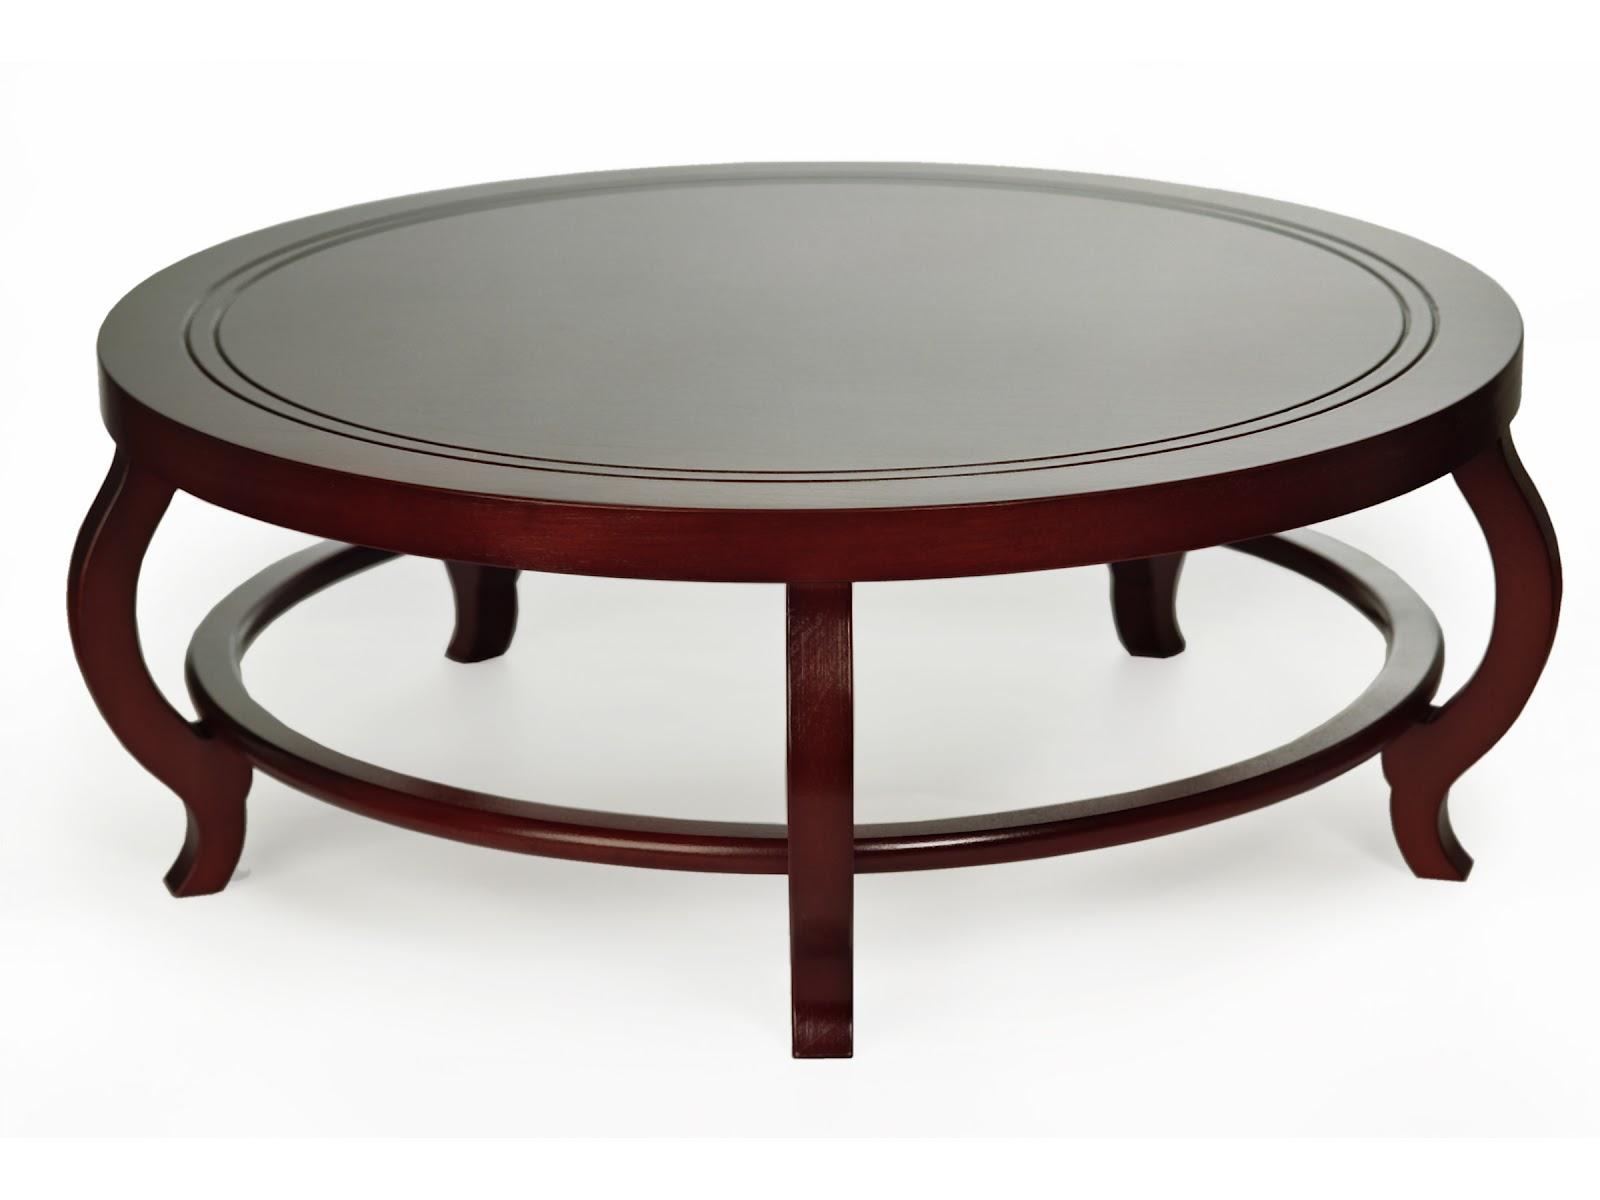 El taller del bons i mesa redonda aro - Mesas para bonsai ...